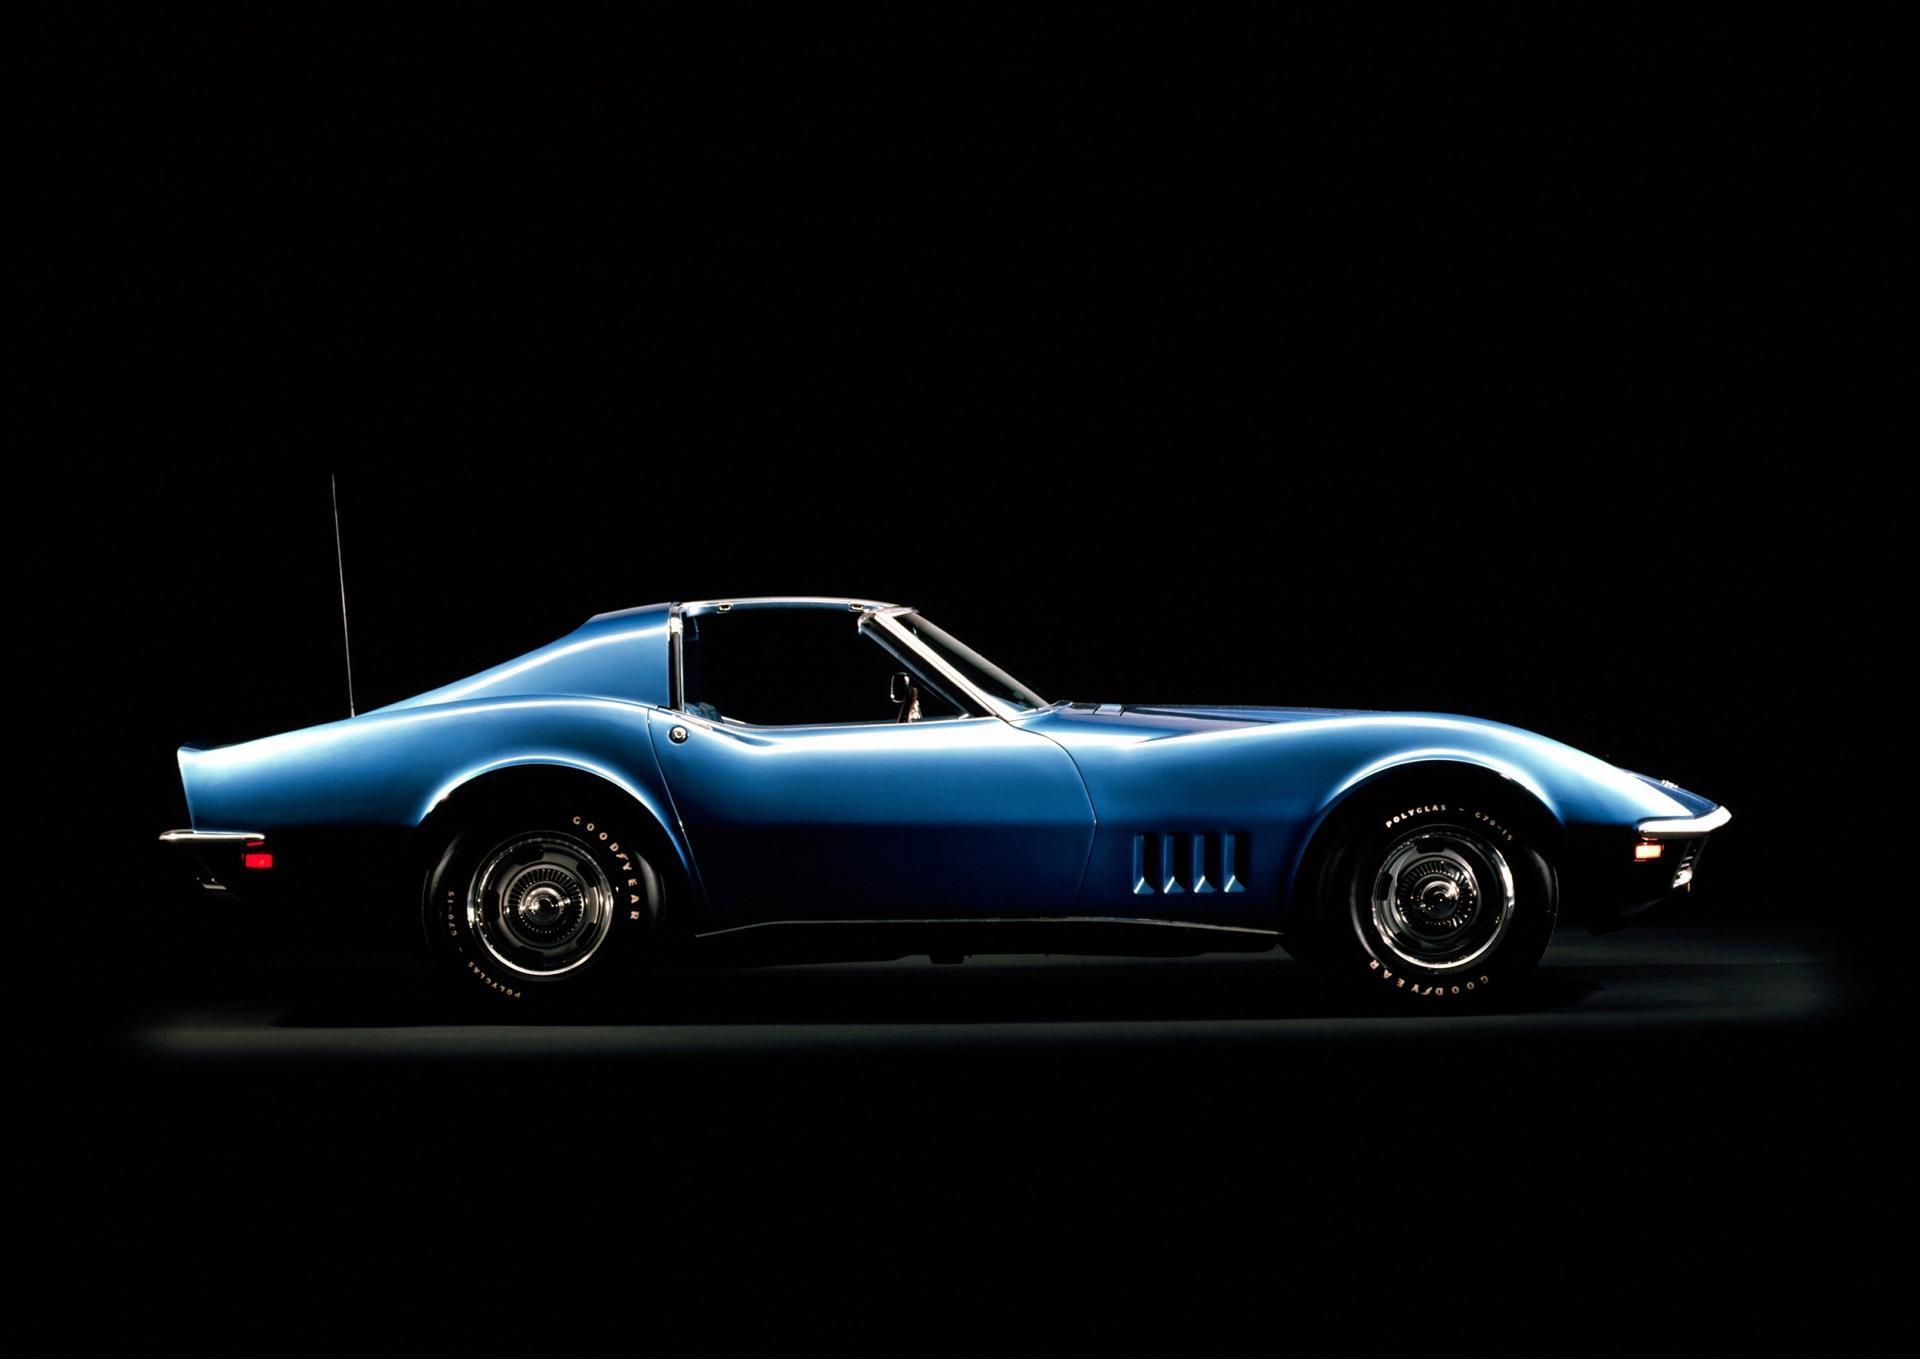 1968 Chevrolet Corvette C3 Image